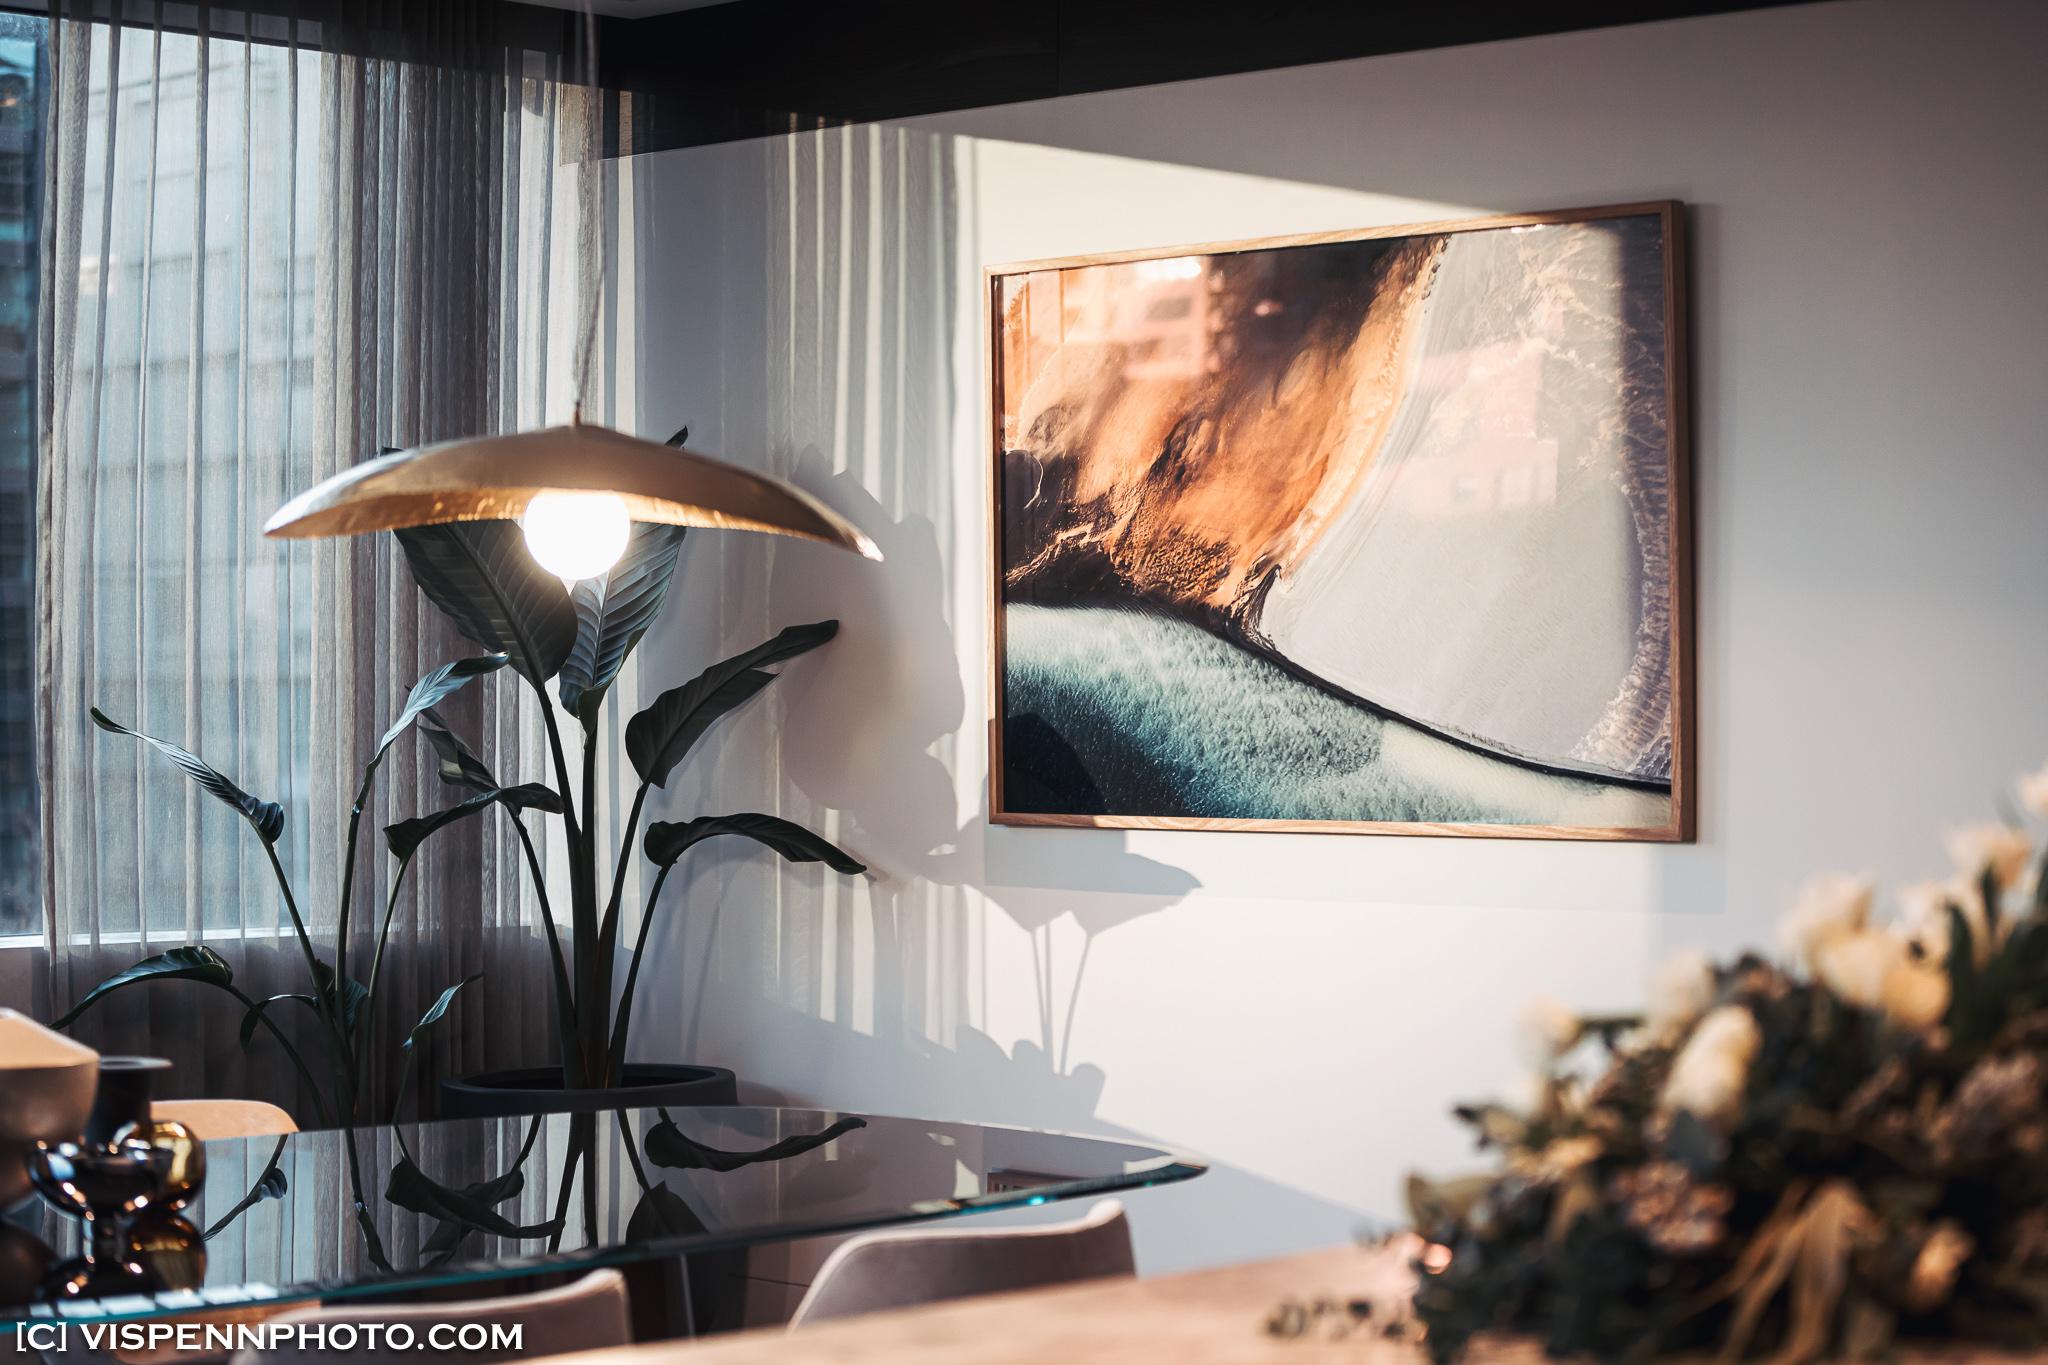 REAL ESTATE INTERIOR Photography Melbourne VISPENN 墨尔本 地产摄影 公寓拍摄 豪宅拍摄 VR远程看房 房产航拍 5D5 6392